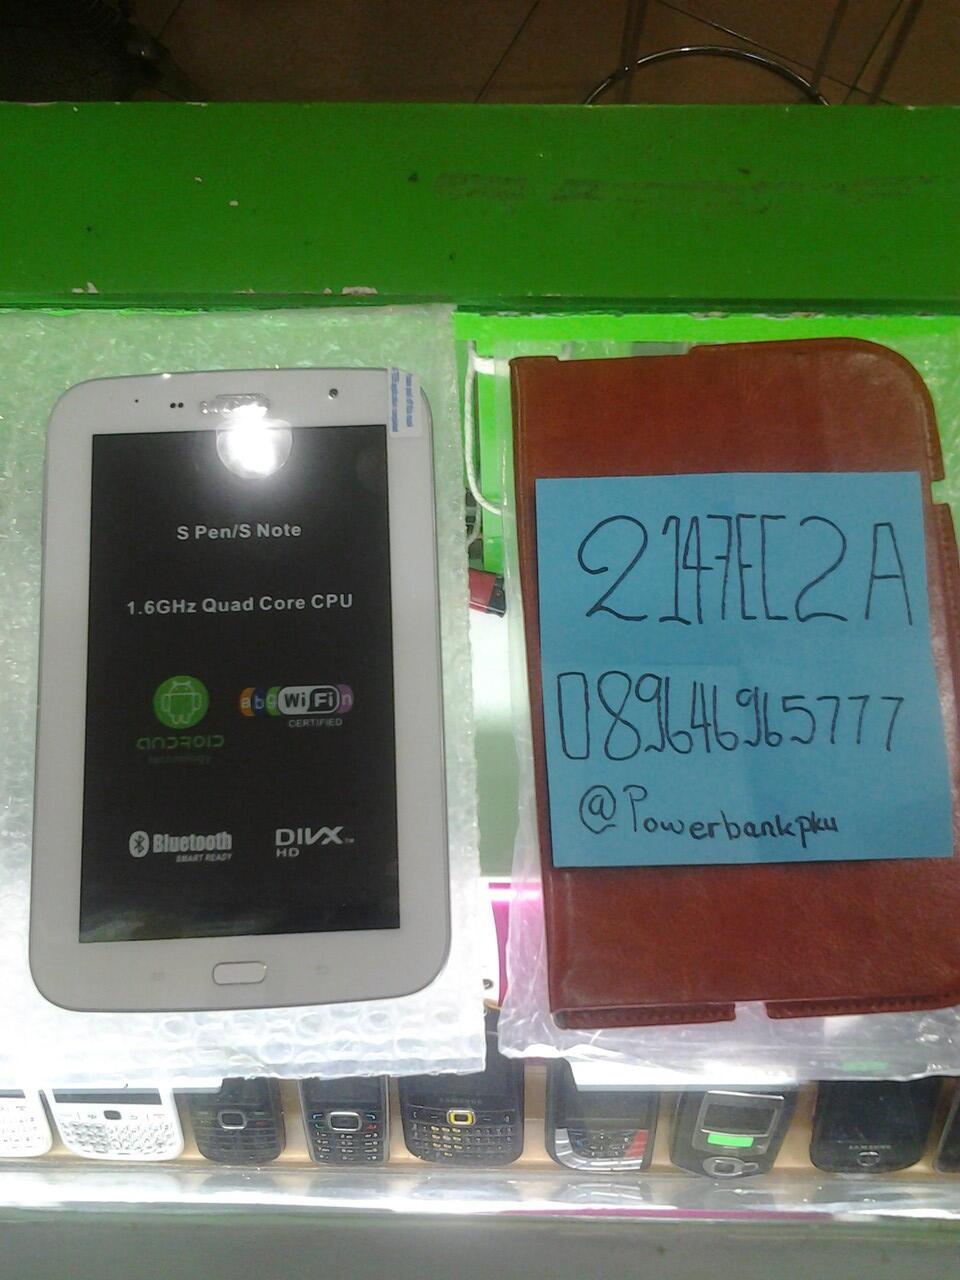 Samsung SuperCopy Replica S4 , S5 , GRAND 2 DUOS NOTE 3 , NOTE8 , iPhone5 , 5c , 5s